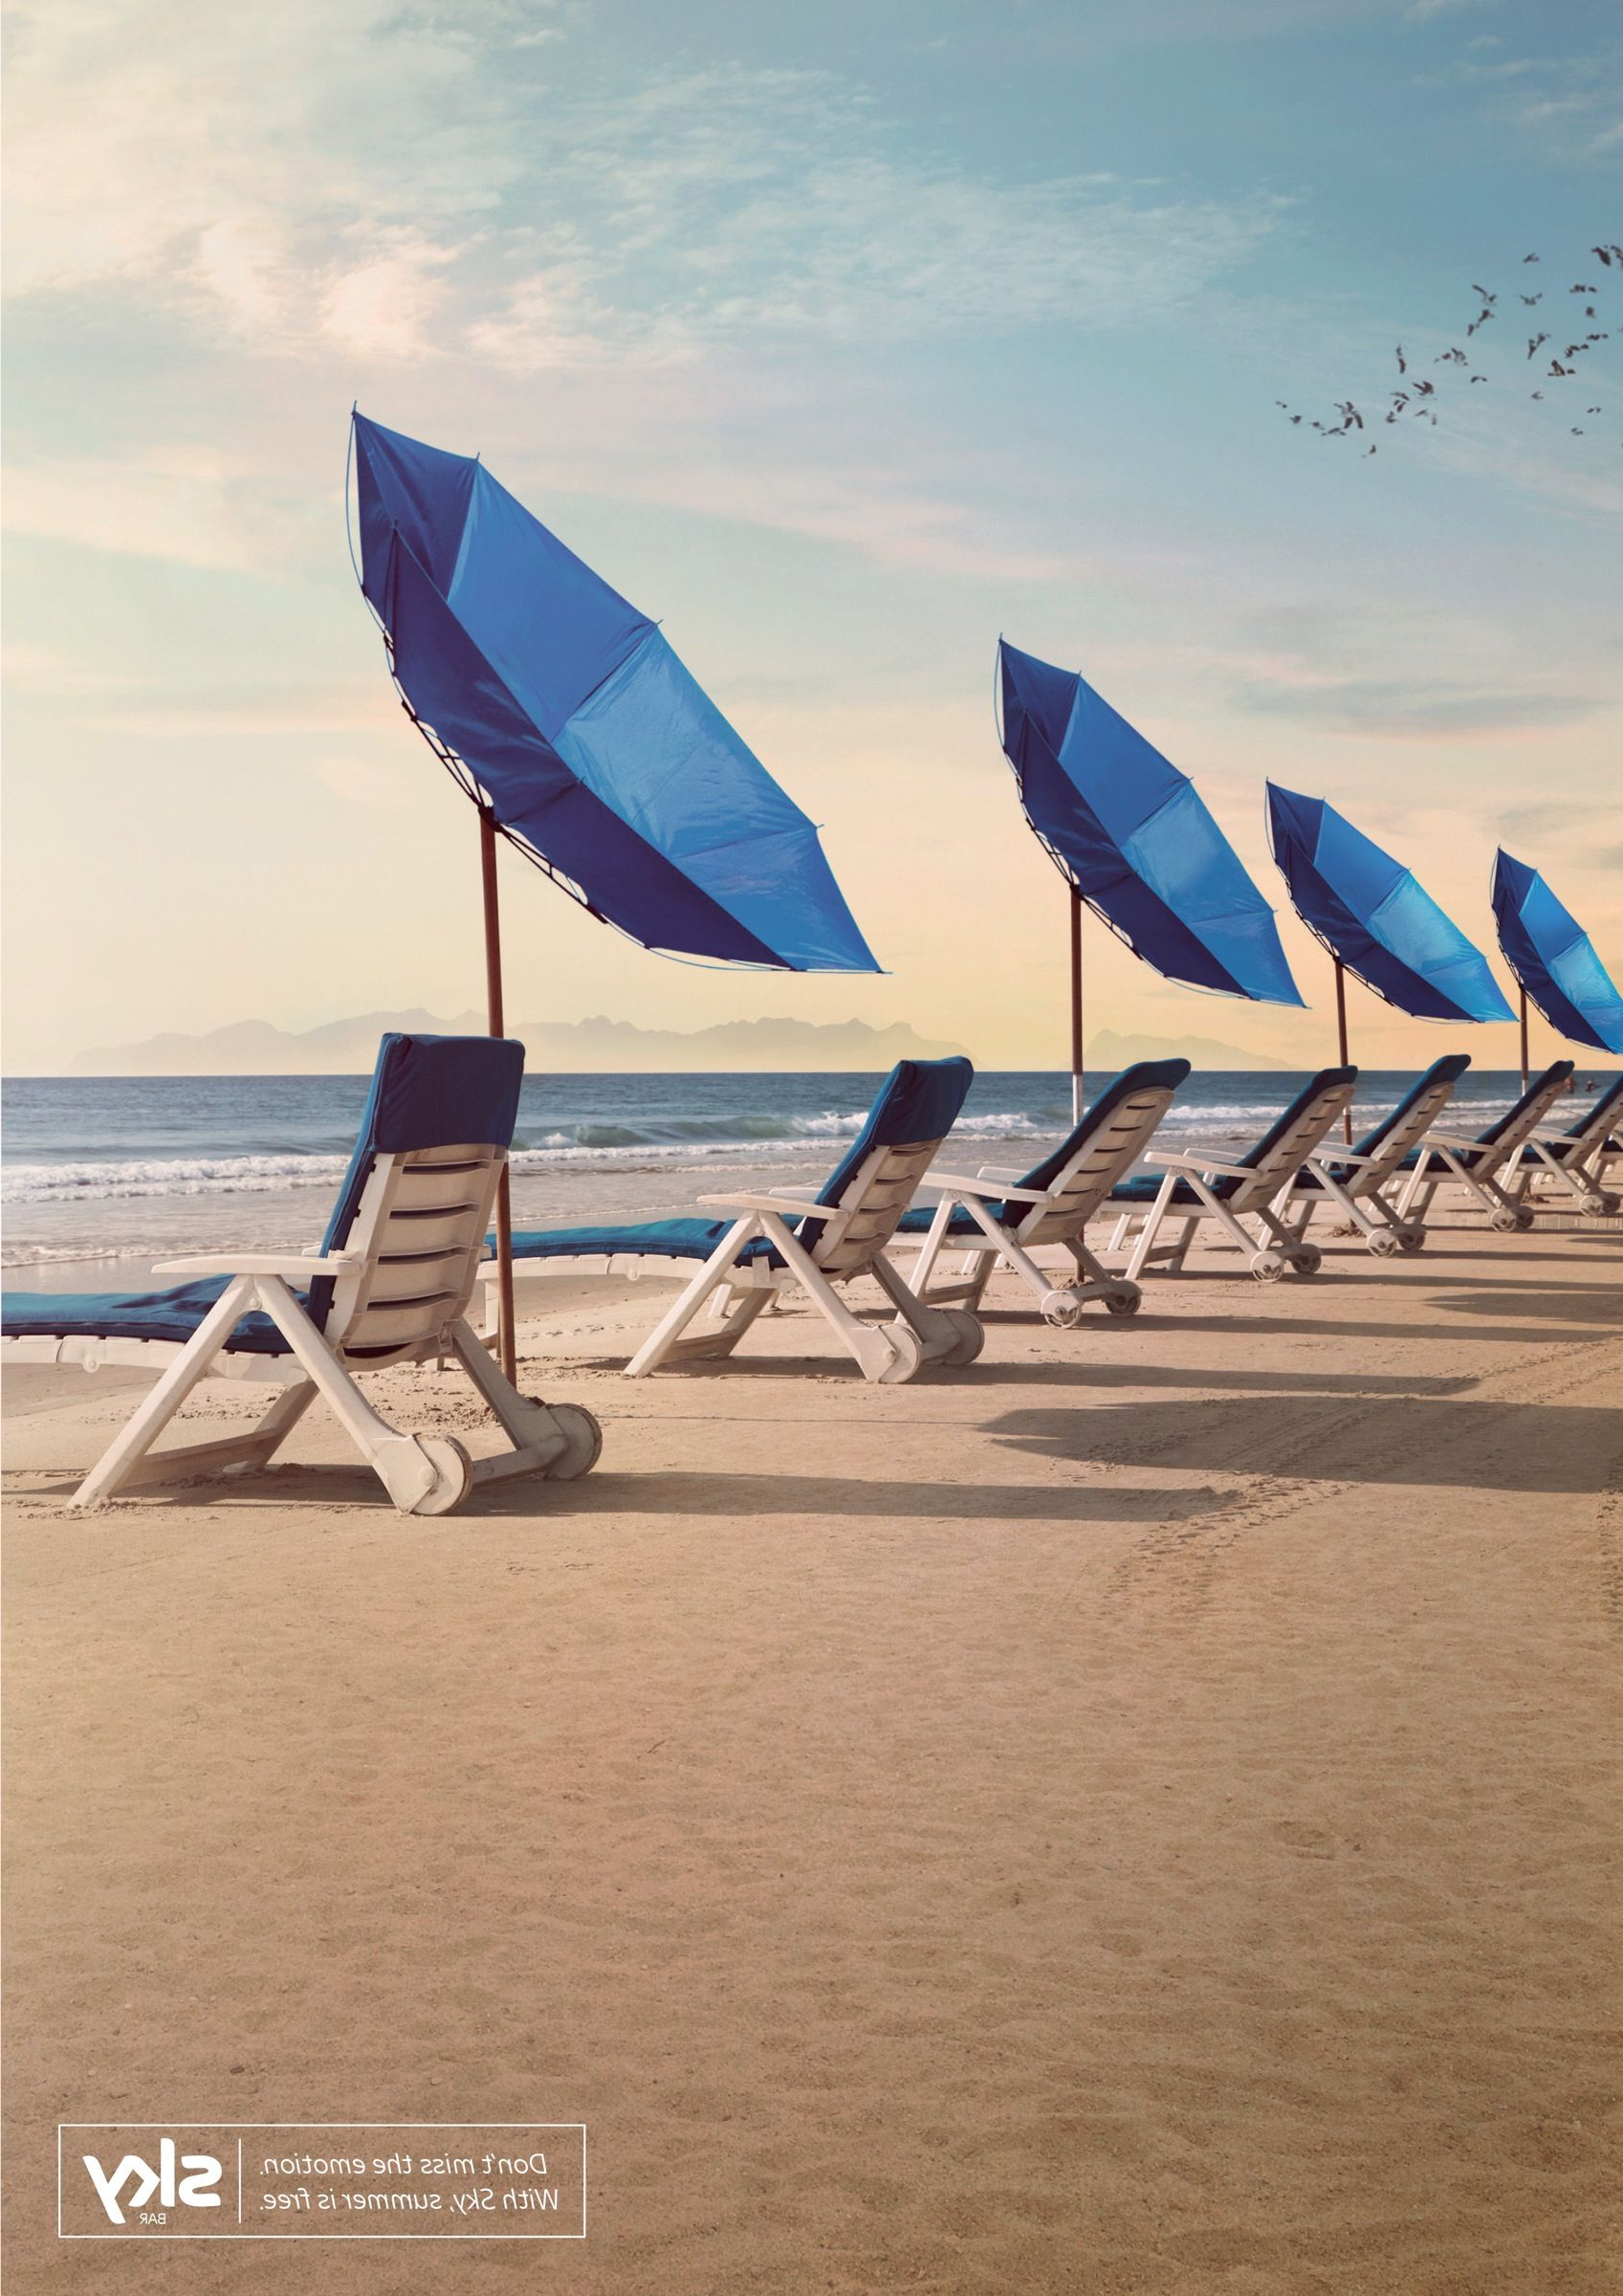 Julian Beach Umbrellas In Most Popular Sky: Beach Umbrellas (View 9 of 20)